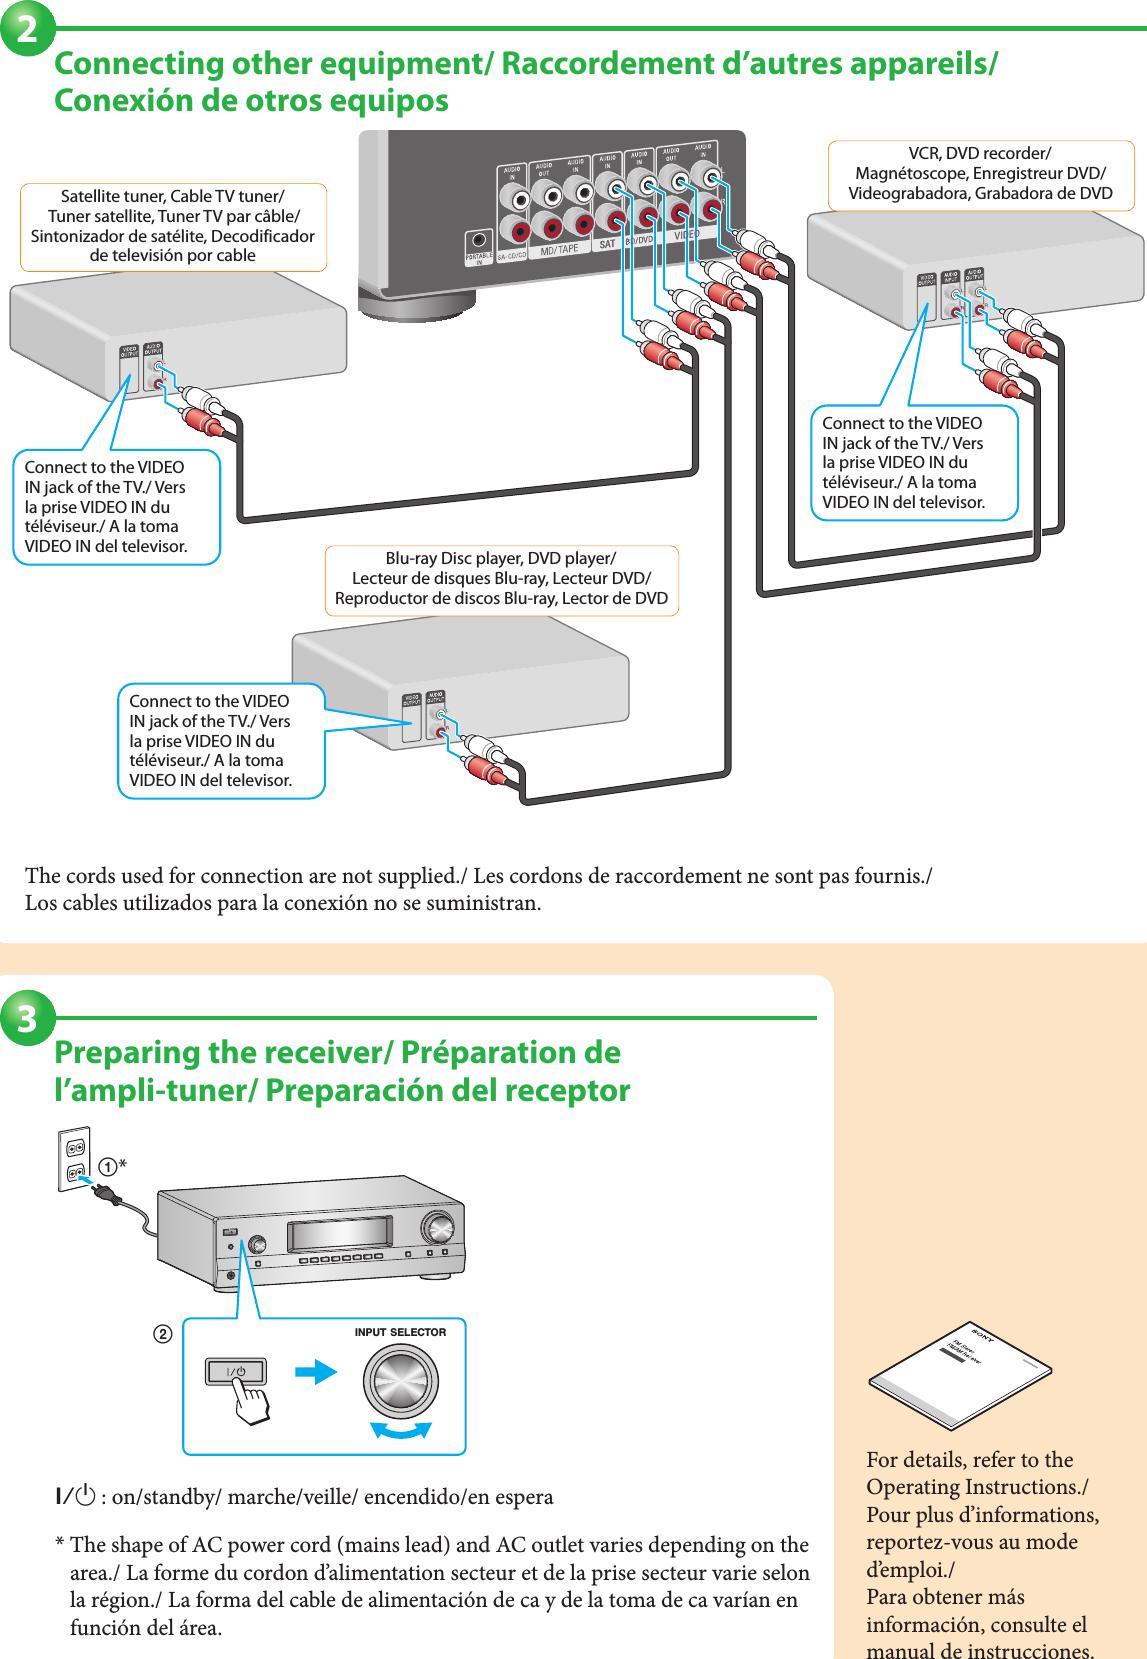 Sony Strdh130 Manual Ebook Diagram Potain Tower Crane Specification Software Block Basic Array Rh Elzplorers De